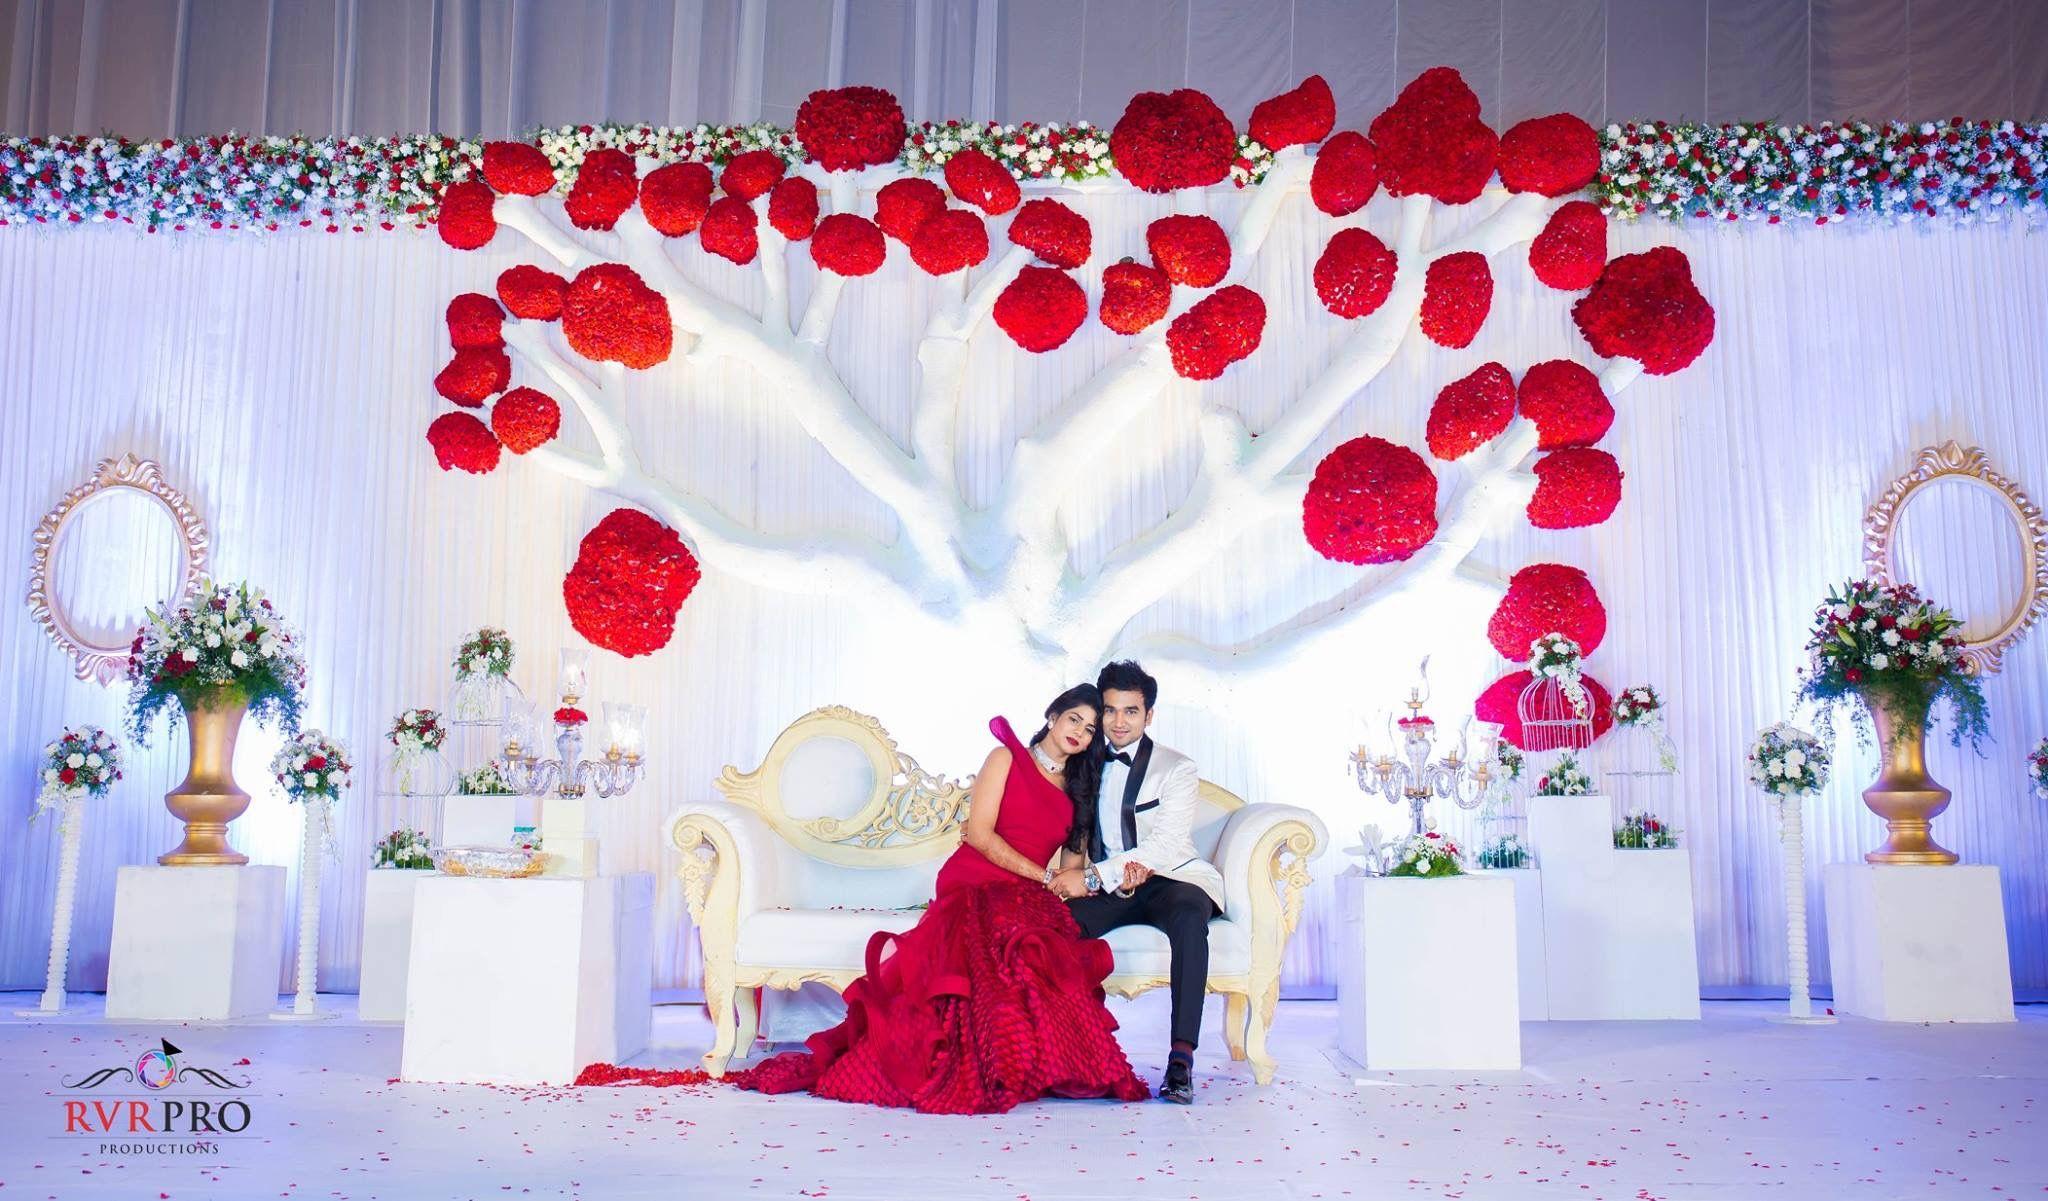 Pin By Sushmitha Reddy On Weddings Personalized Wedding Decor